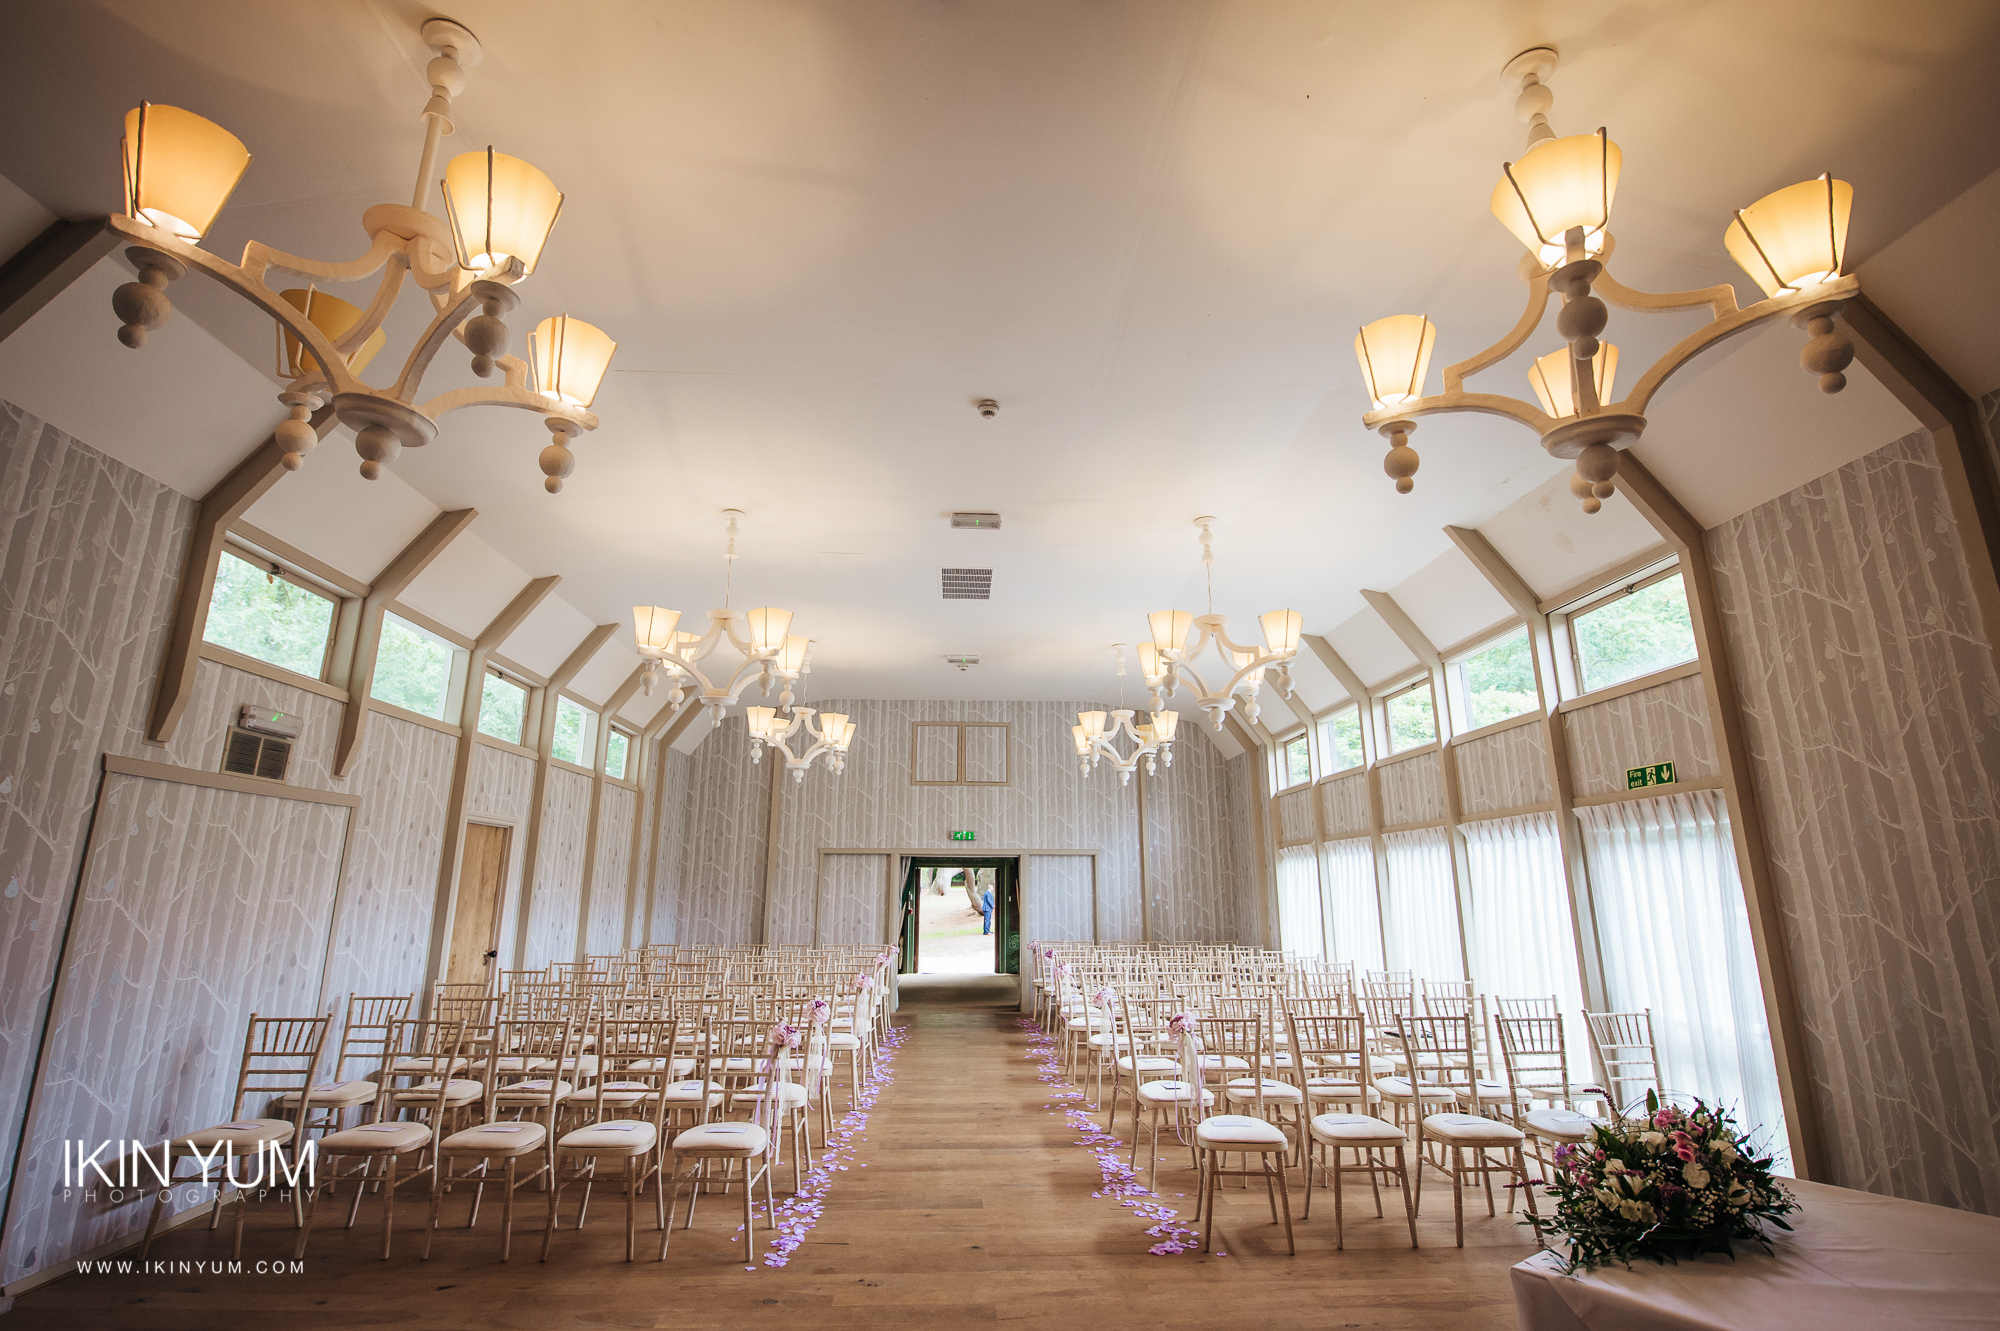 Hampton Manor Wedding - Ikin Yum Photography -051.jpg